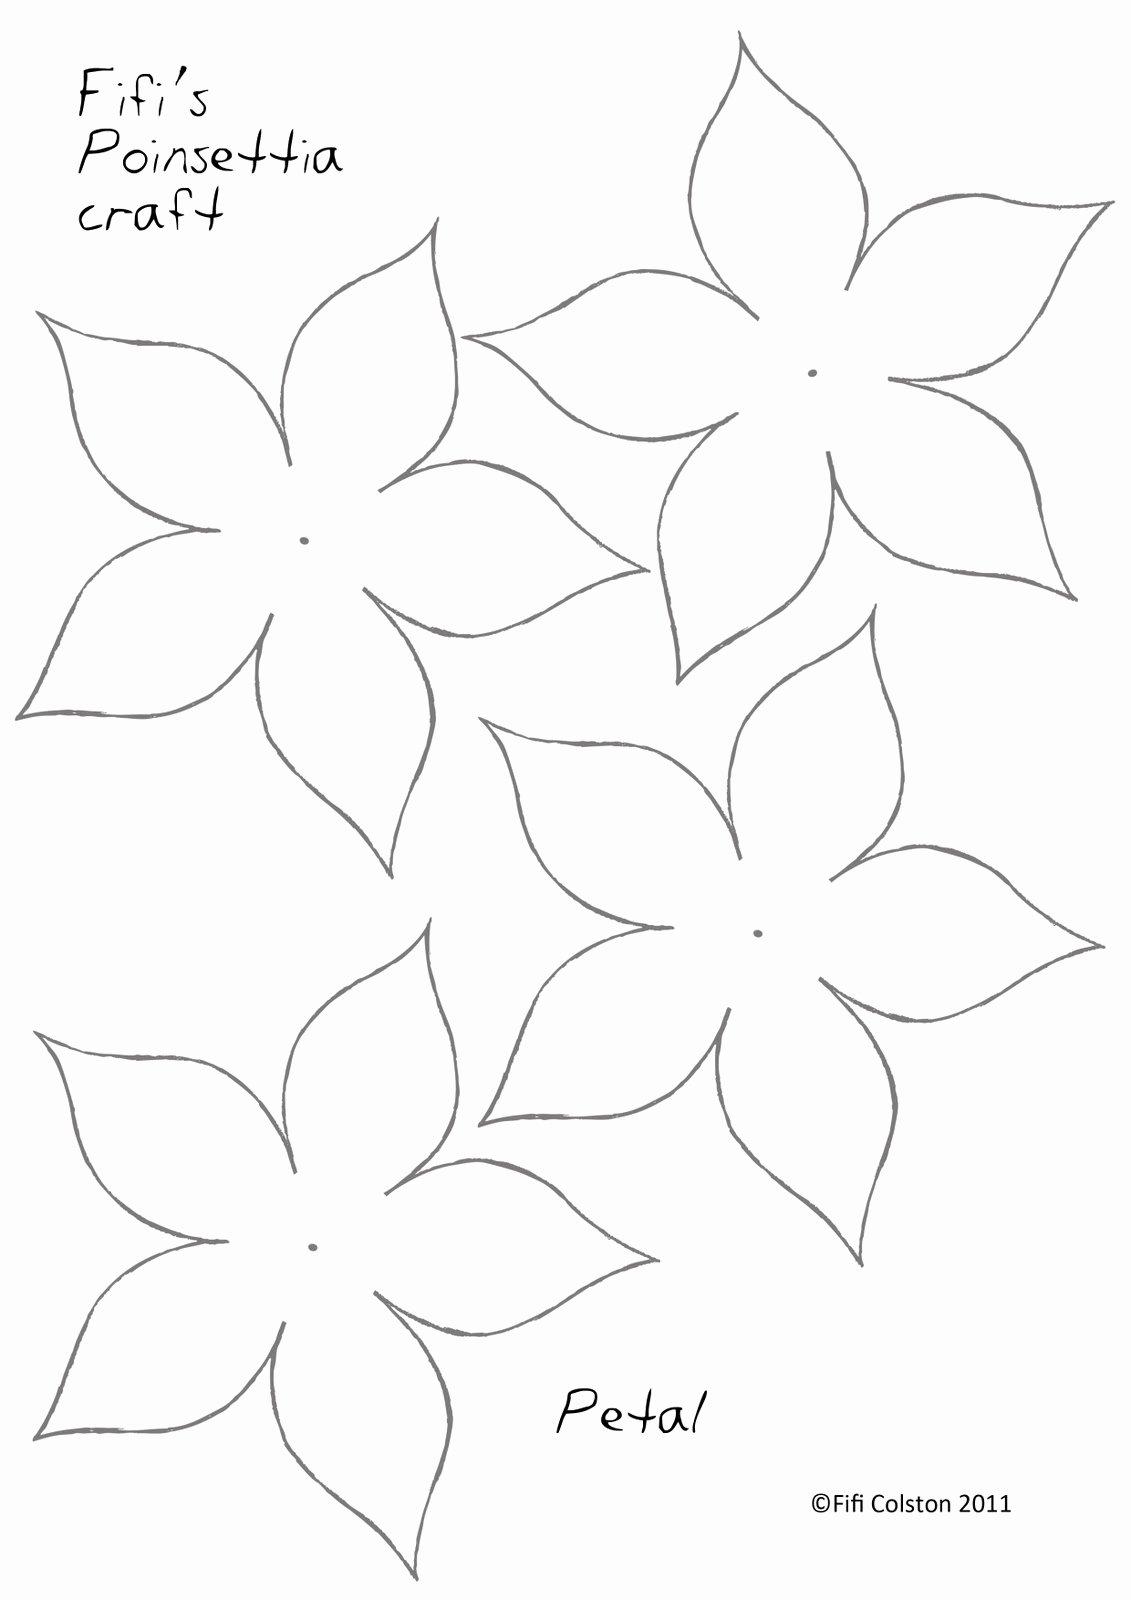 Paper Flower Petal Template Best Of Fifi Colston Creative Pretty Paper Poinsettias